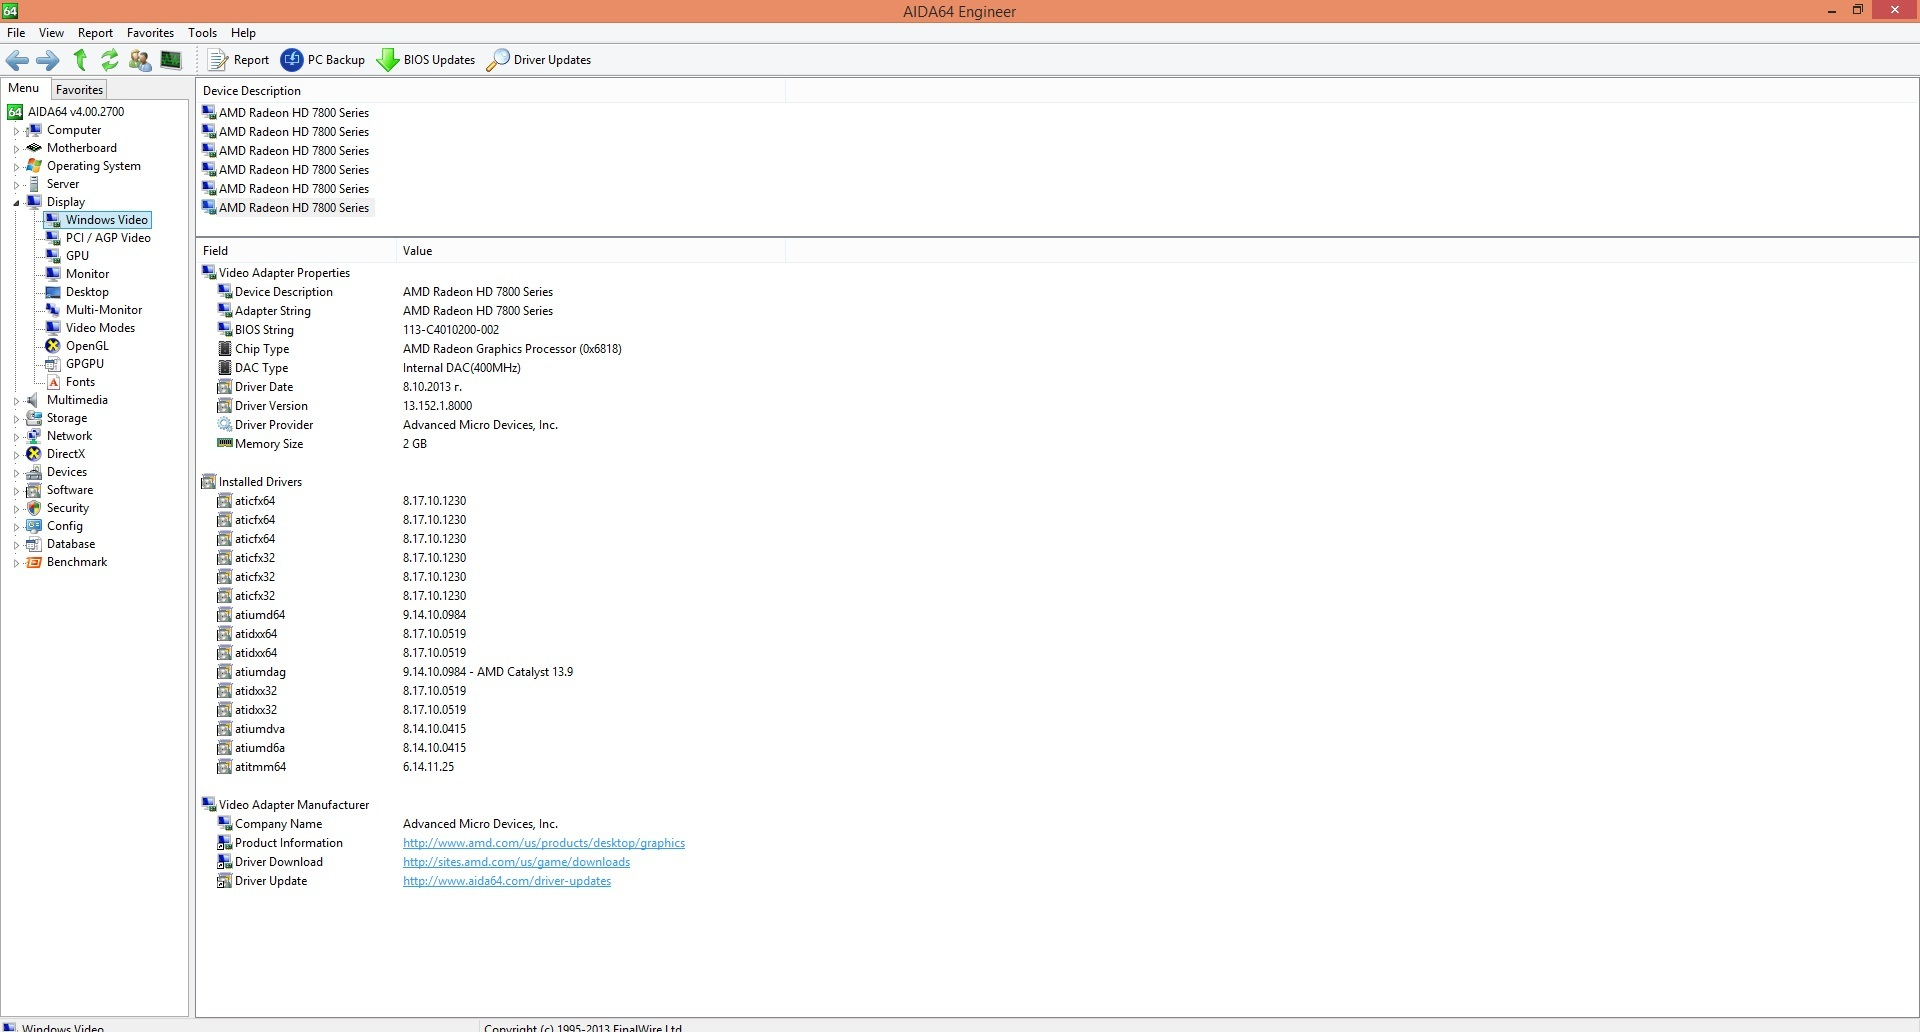 Speed Game Pro I HD7870 aida vga info